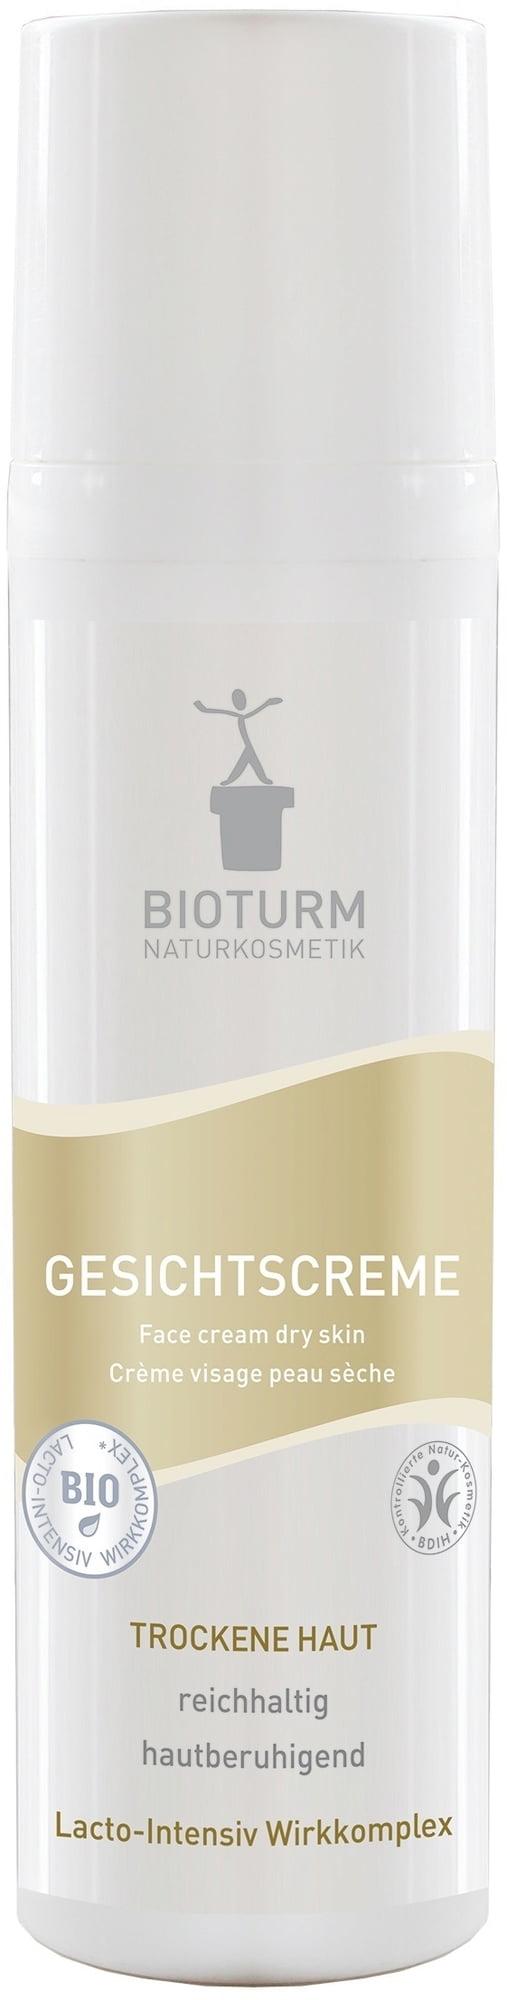 Bioturm Naturkosmetik Face Cream Dry Skin No.8